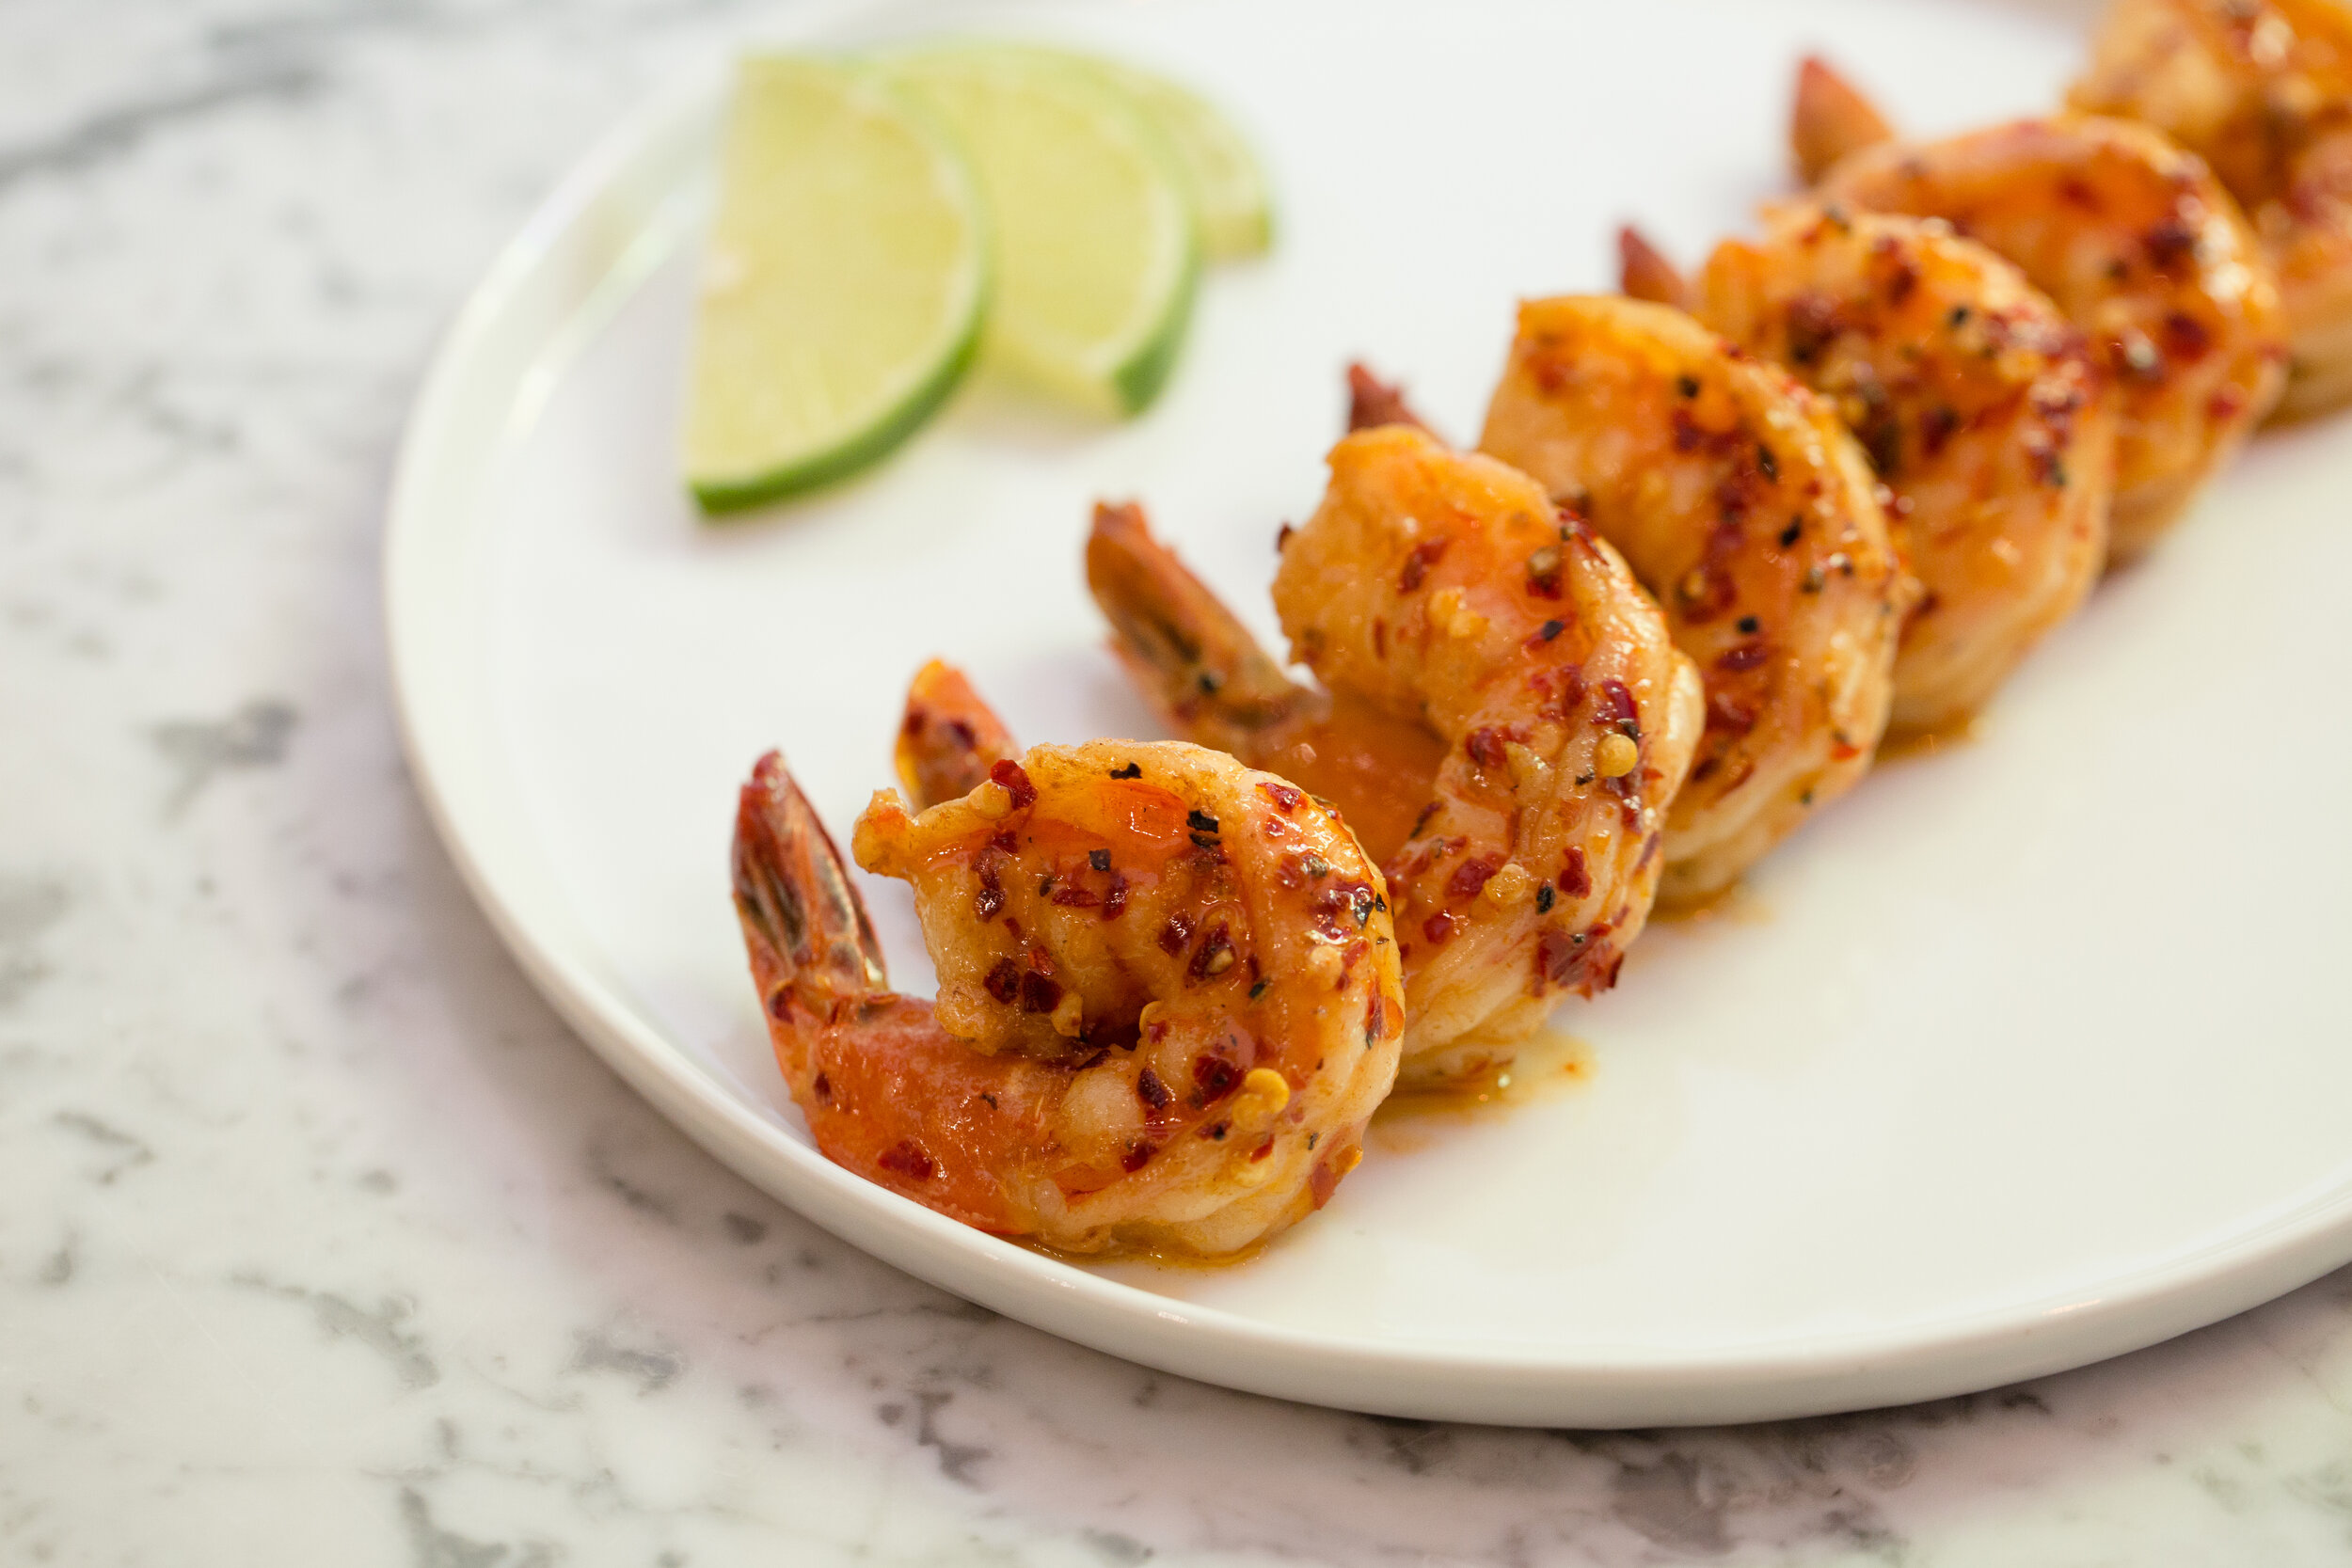 _roc_oysters_salt_and_chili_shrimp.jpg